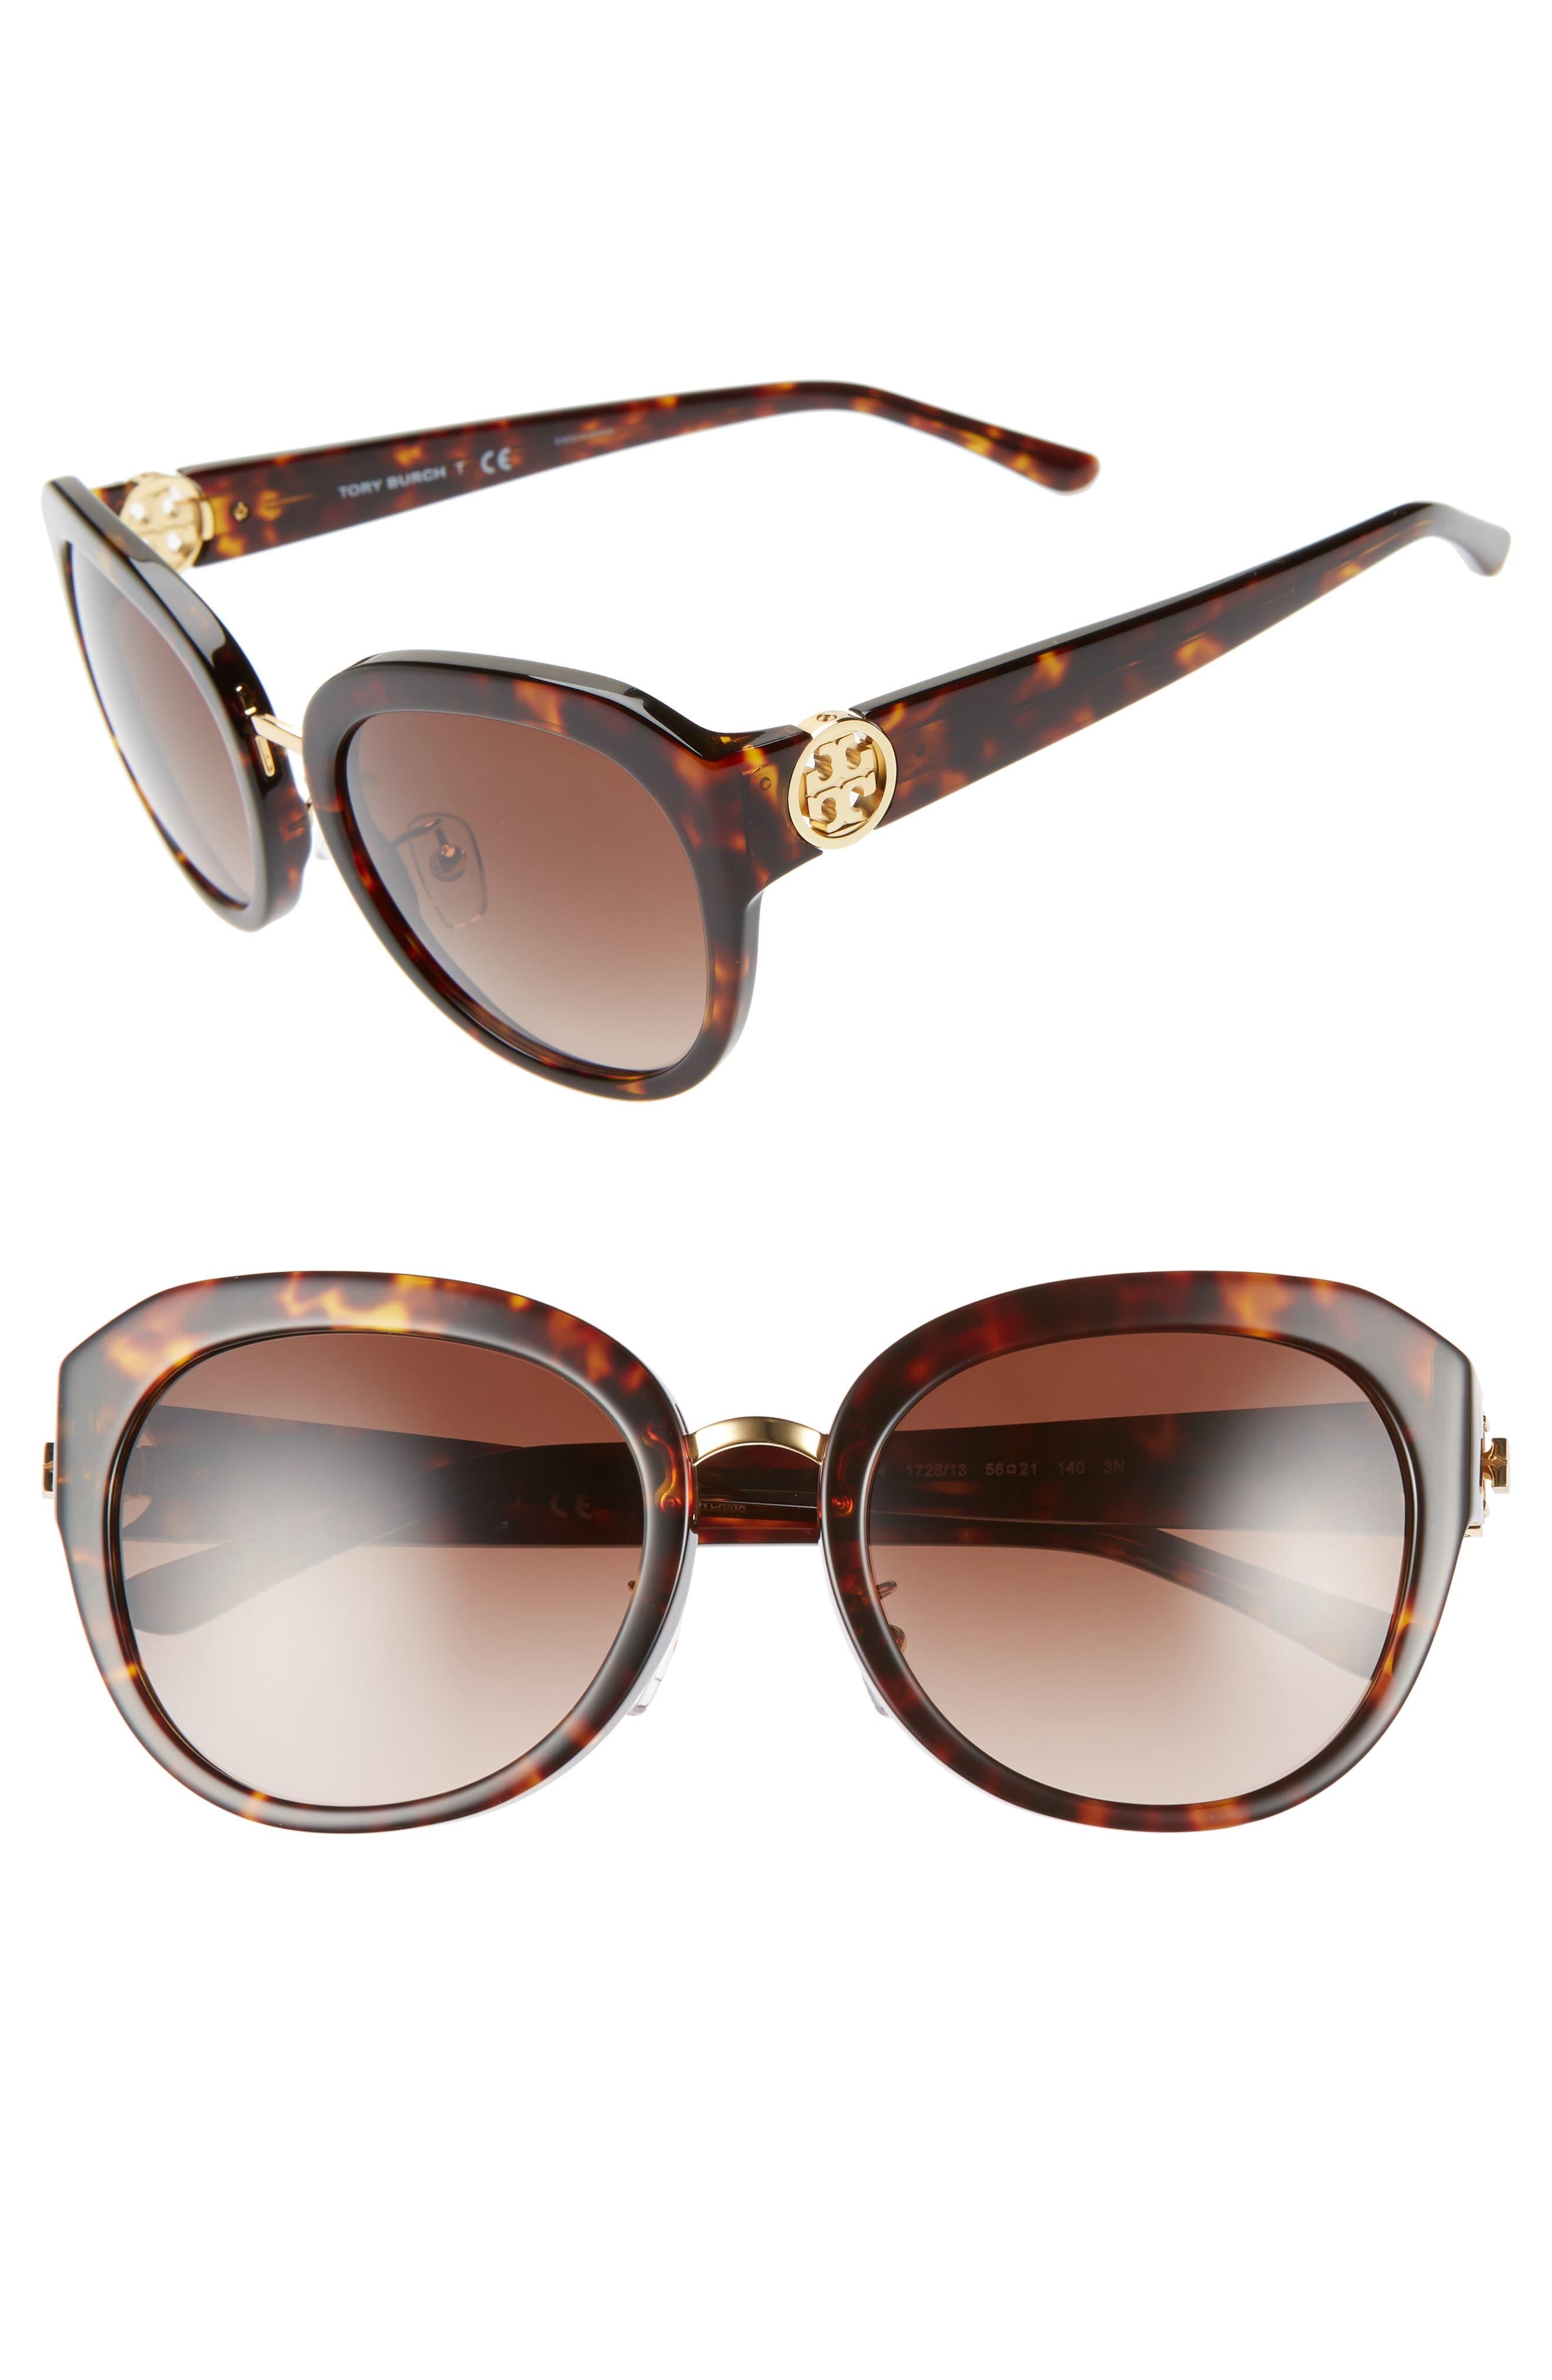 Irregular Reva 56mm Sunglasses,                         Main,                         color, 212